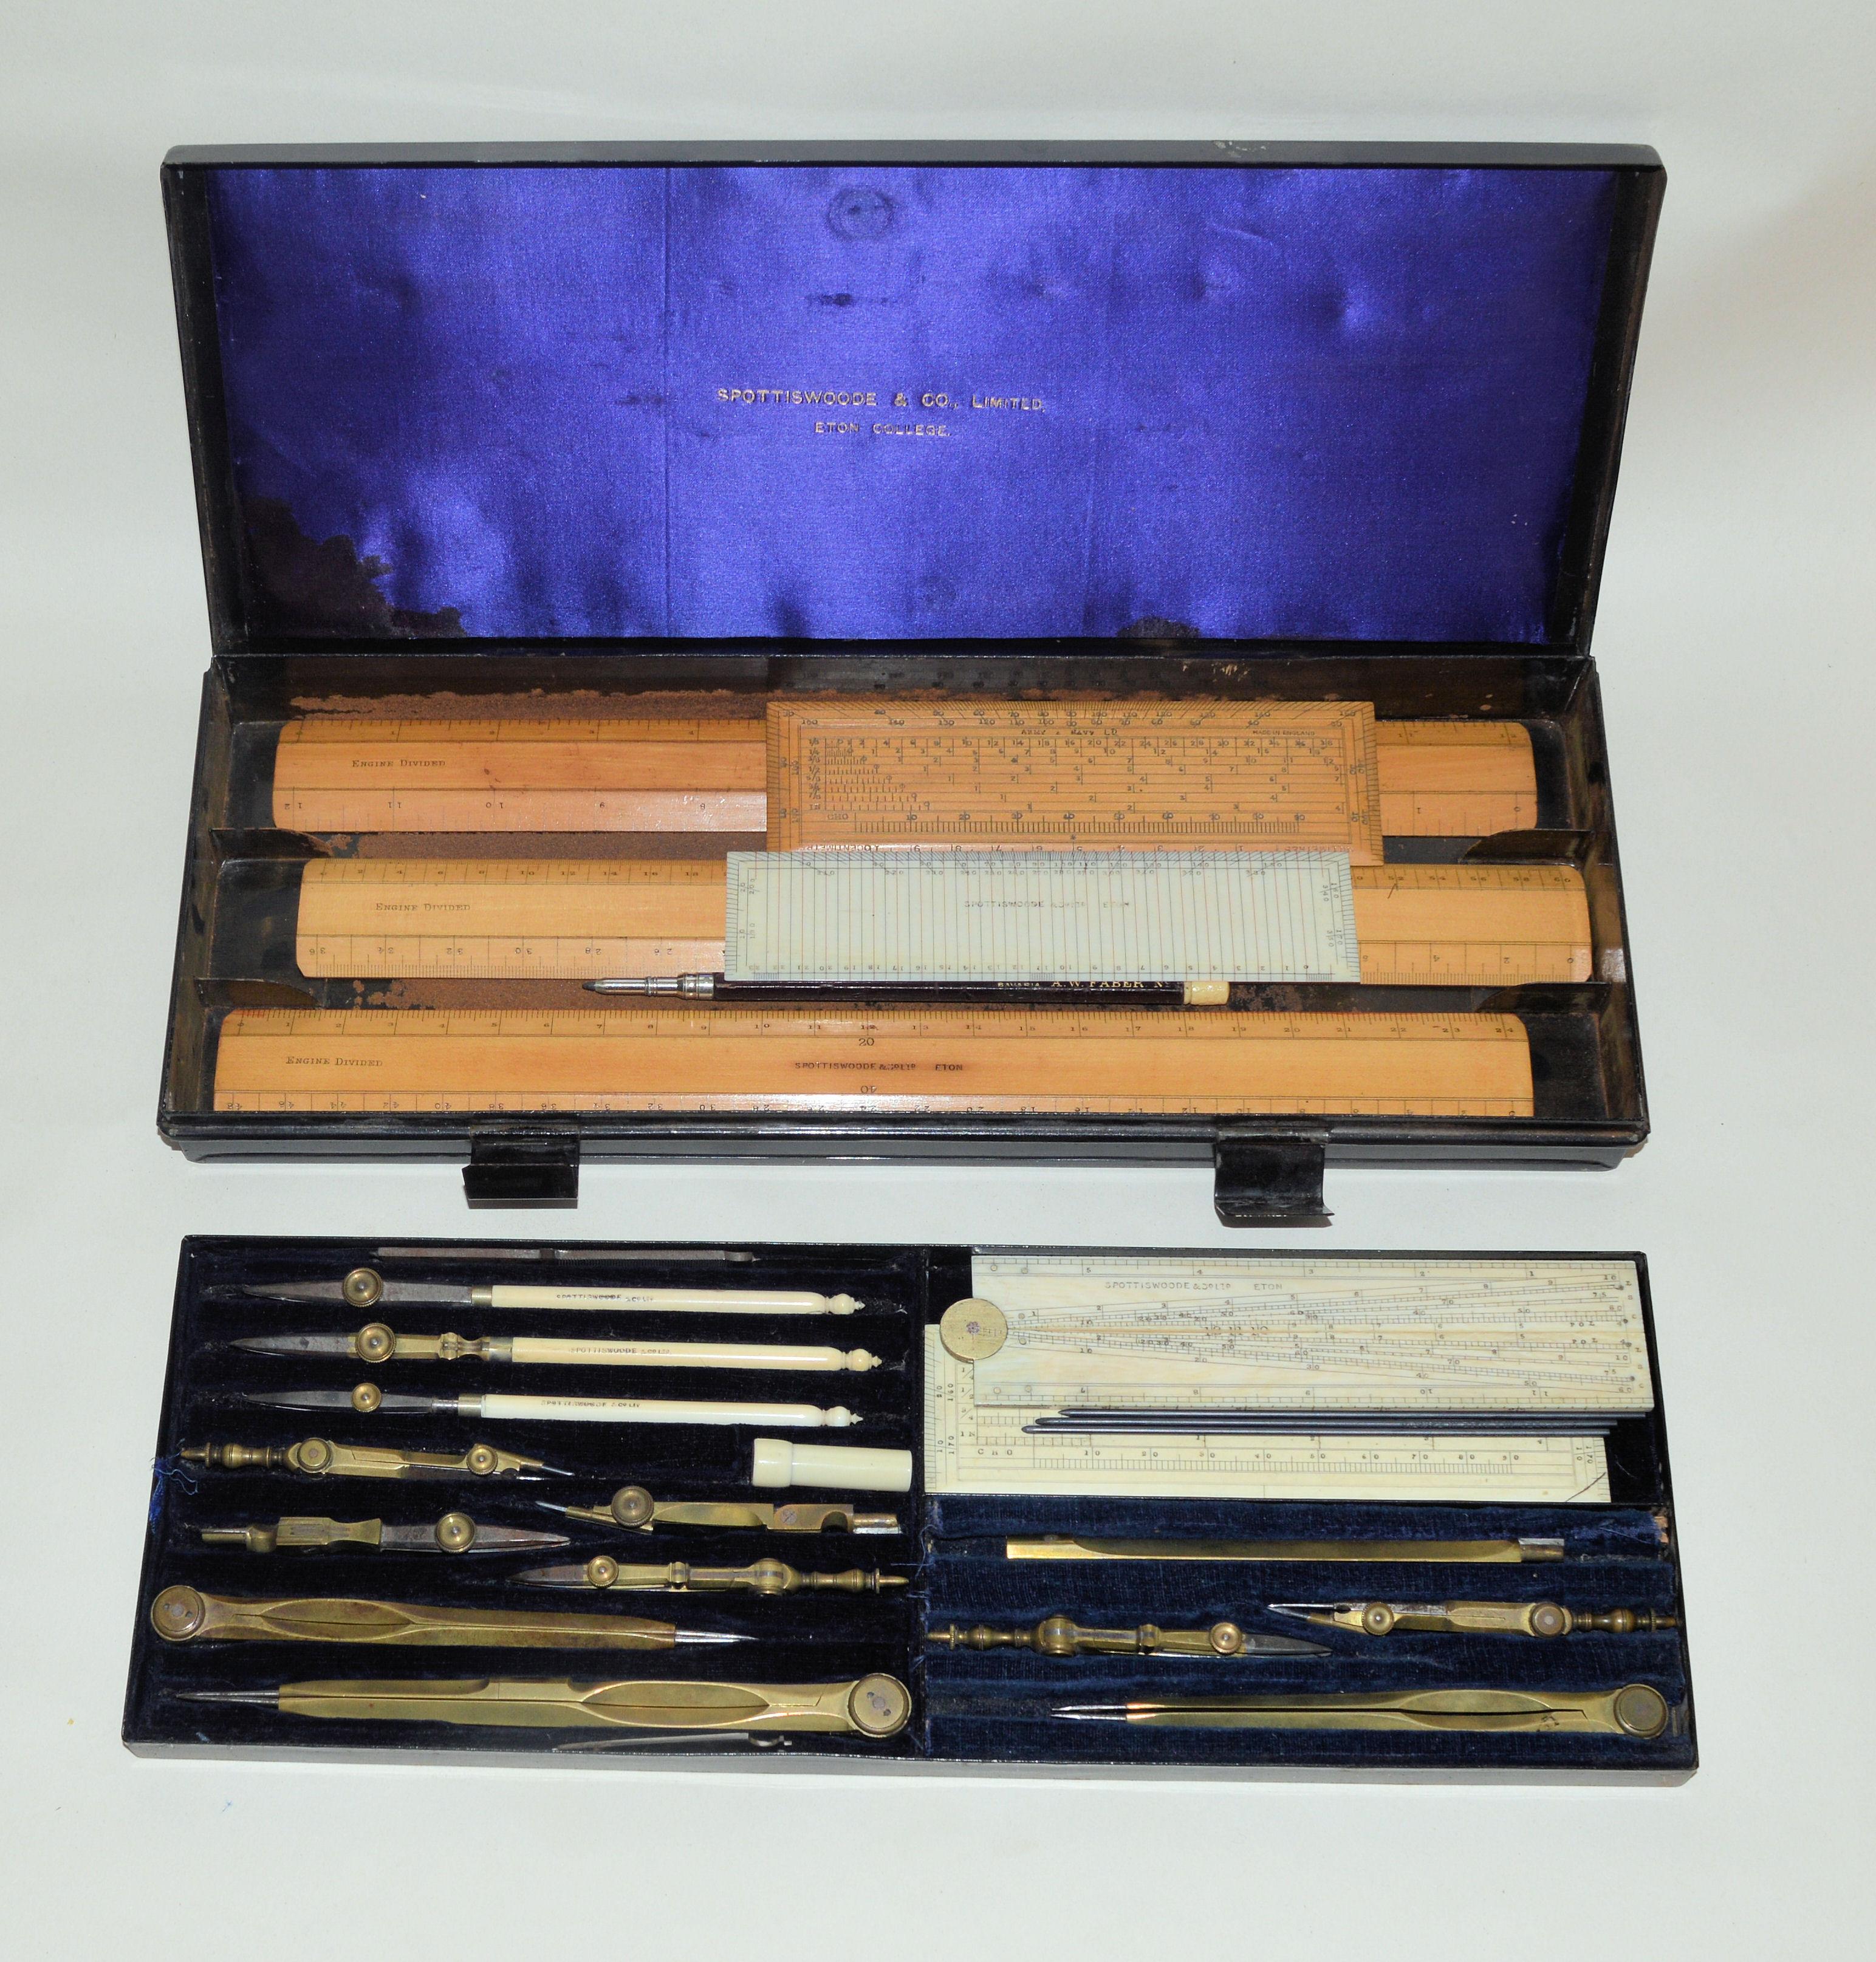 Drawing set in case – Spottiswoode & Co. Ltd., Eton.